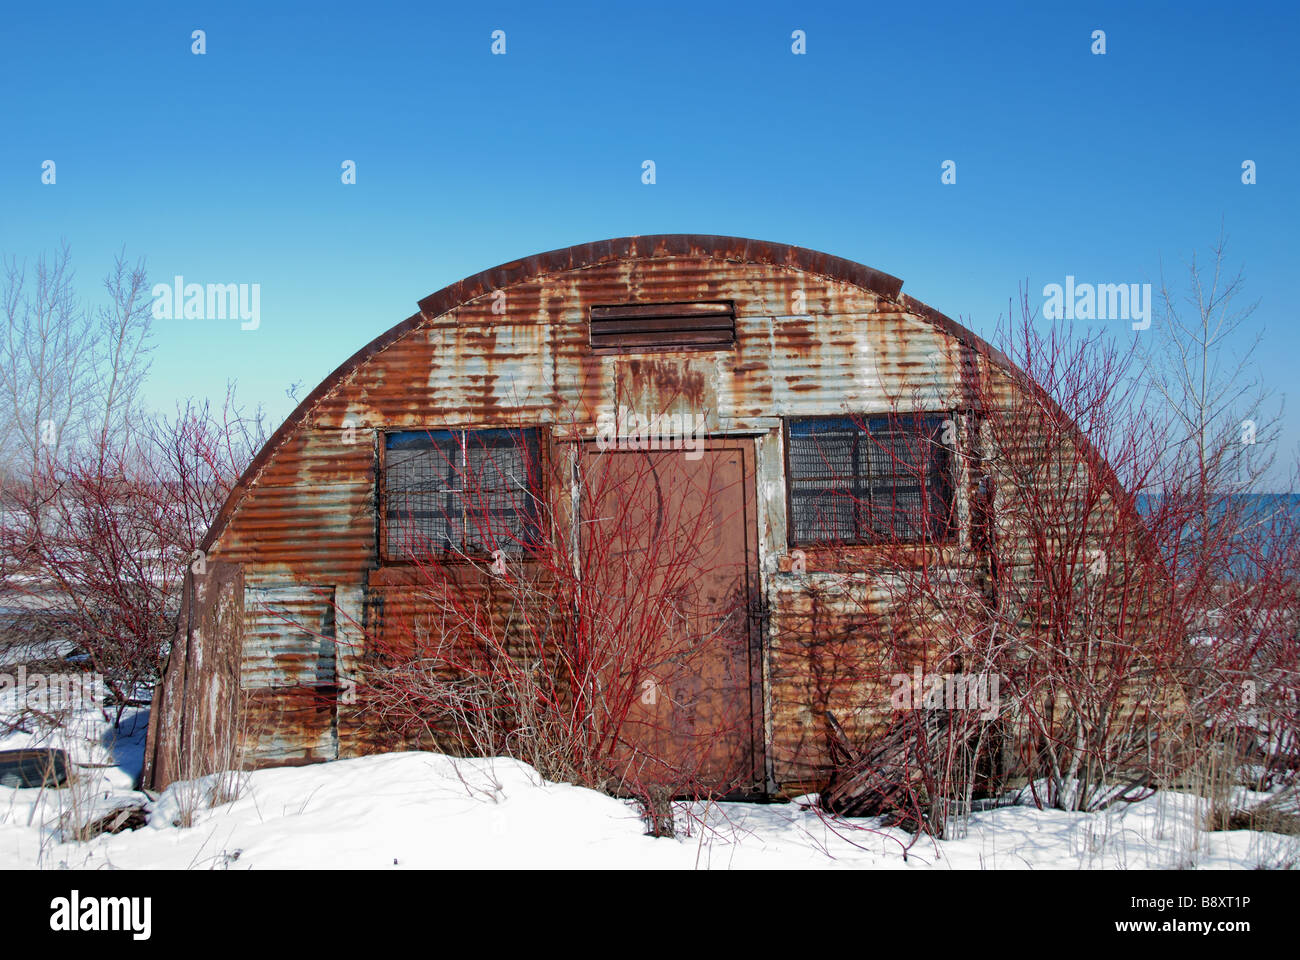 metal huts quonset hut - photo #28